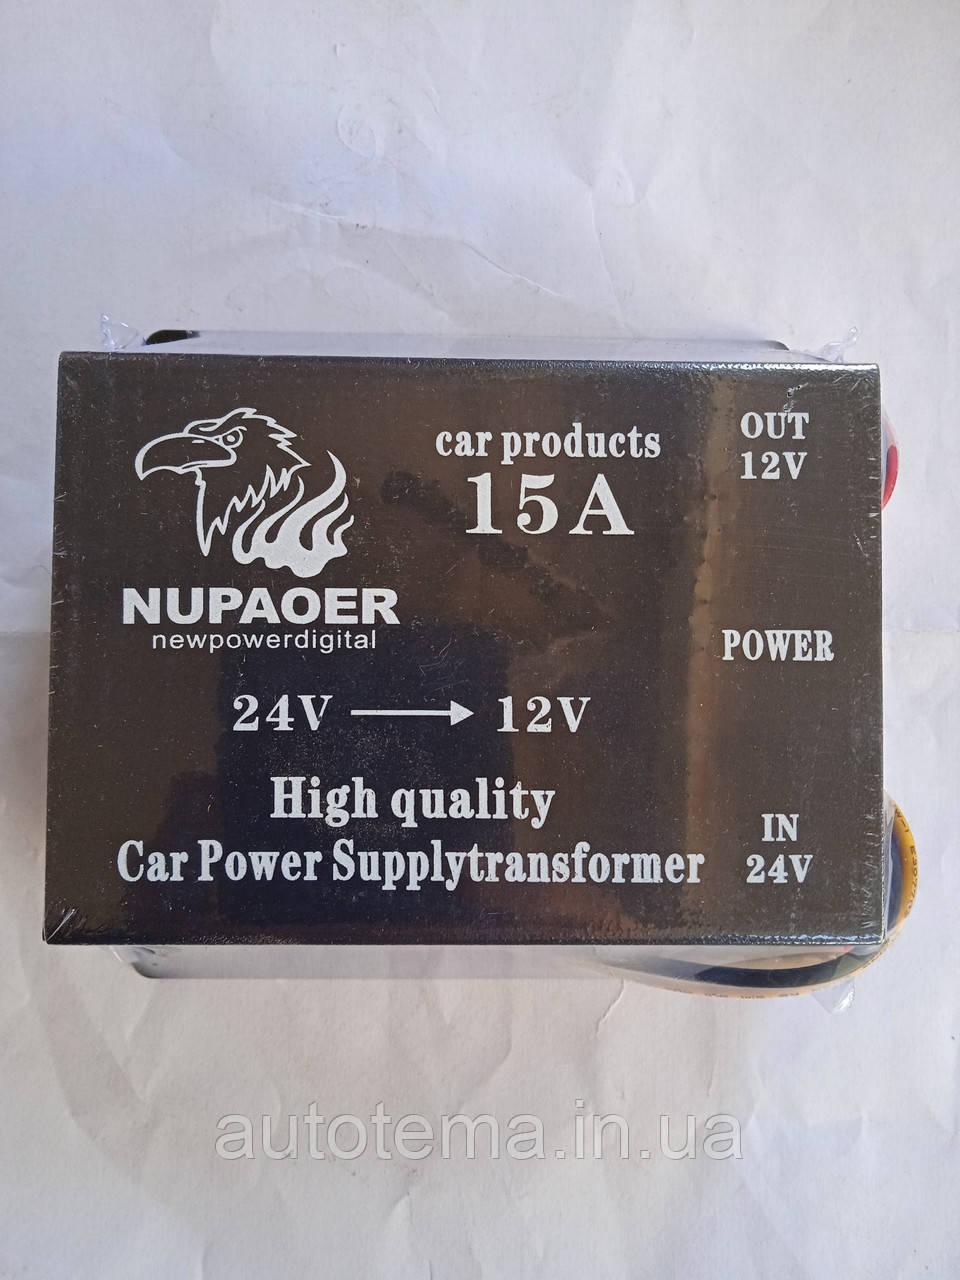 Car Power Supplytransformer in 24 out12 В  15 А